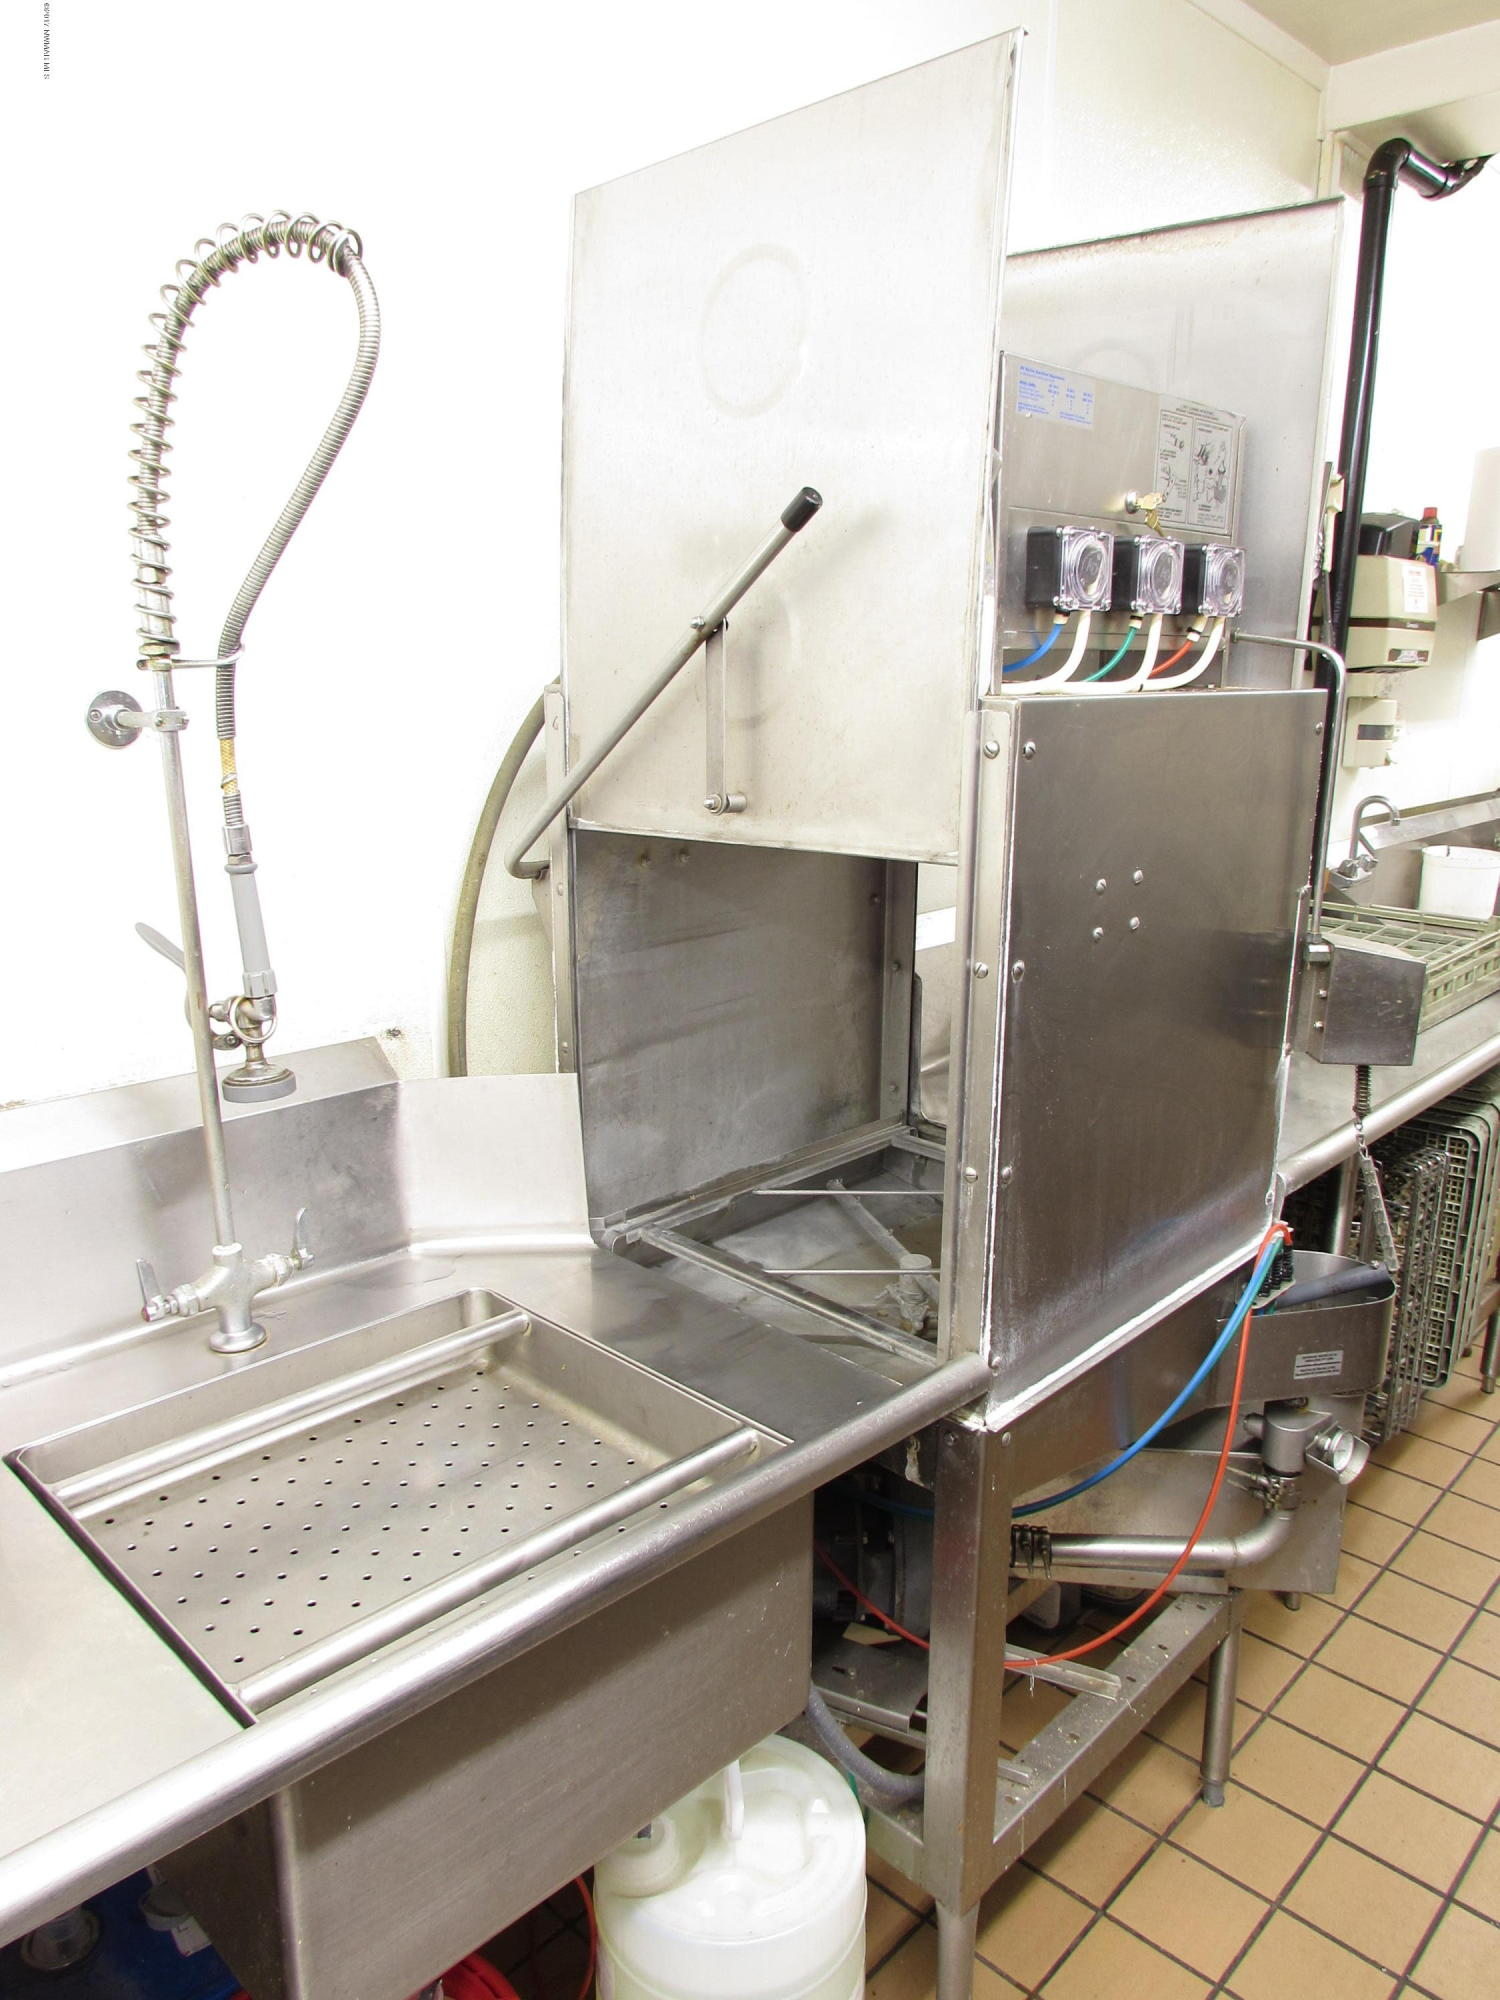 Commerical-grade Dishwasher